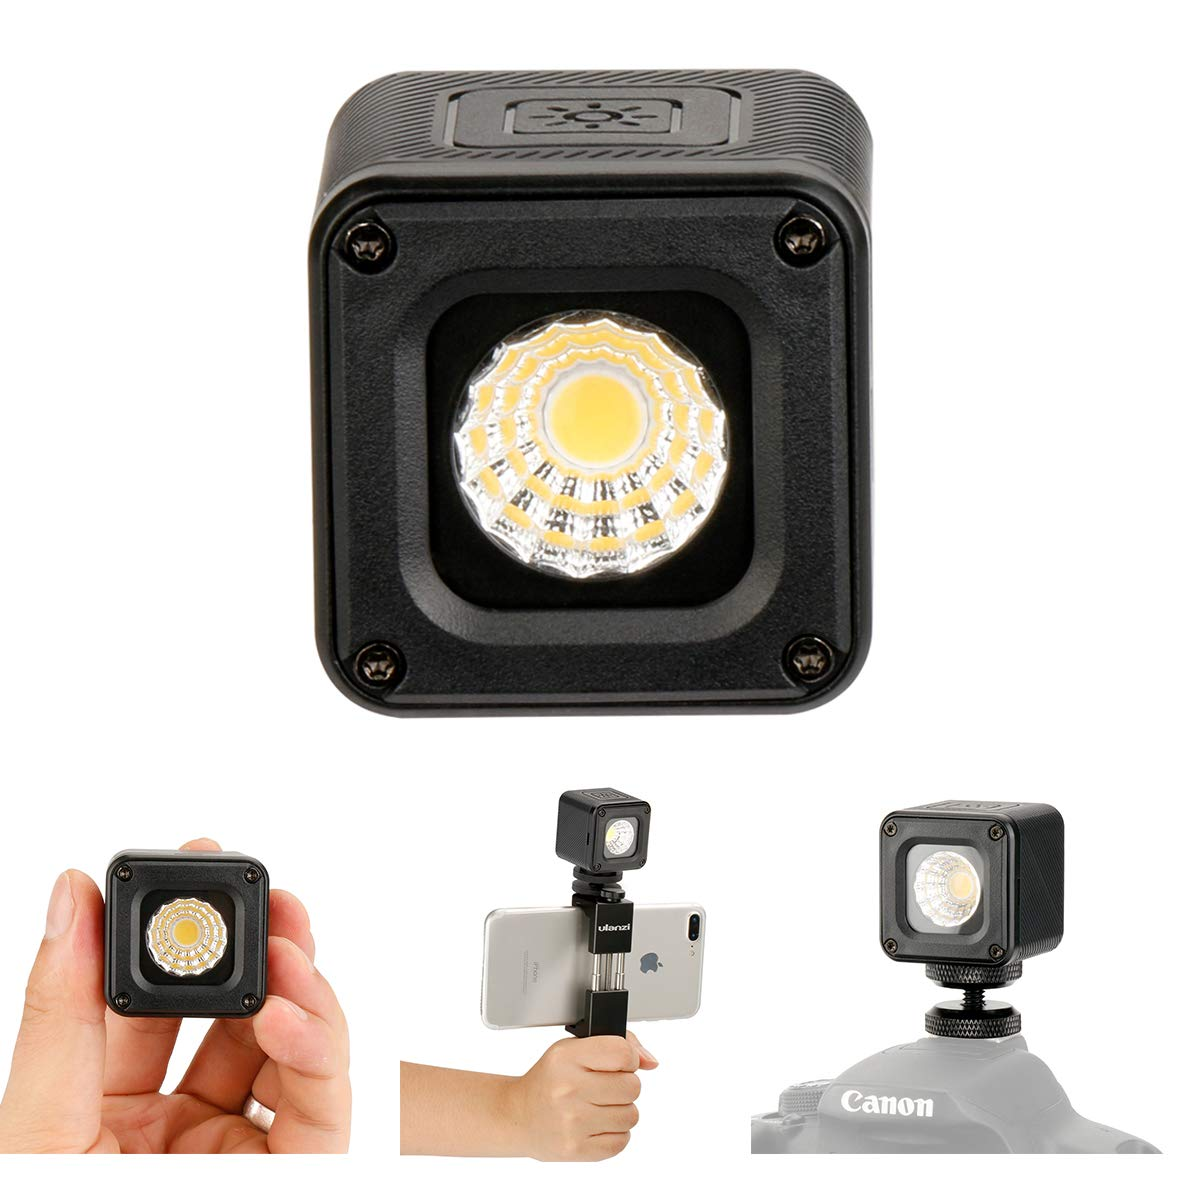 Ulanzi L1防水調整可能LEDビデオライト カメラスタジオ用 万能ライト キヤノン ニコン キャンプライト Gopro 6 5に対応   B07G23963S